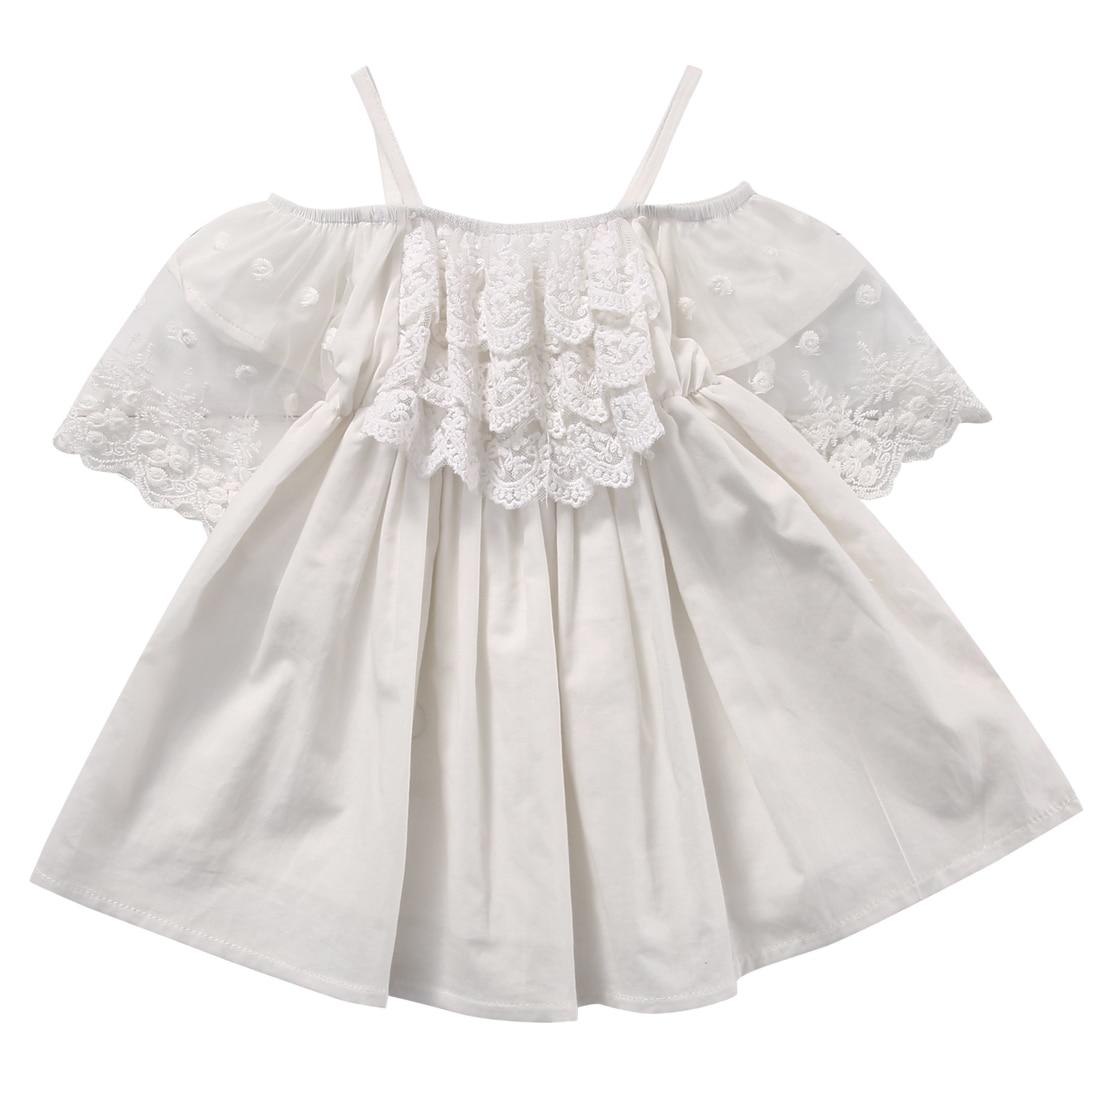 6619af40627 Kids Girls Summer Dress Off-shoulder Ruffles Lace Dresses Solid White Baby  Girl Clothes Princess Costume